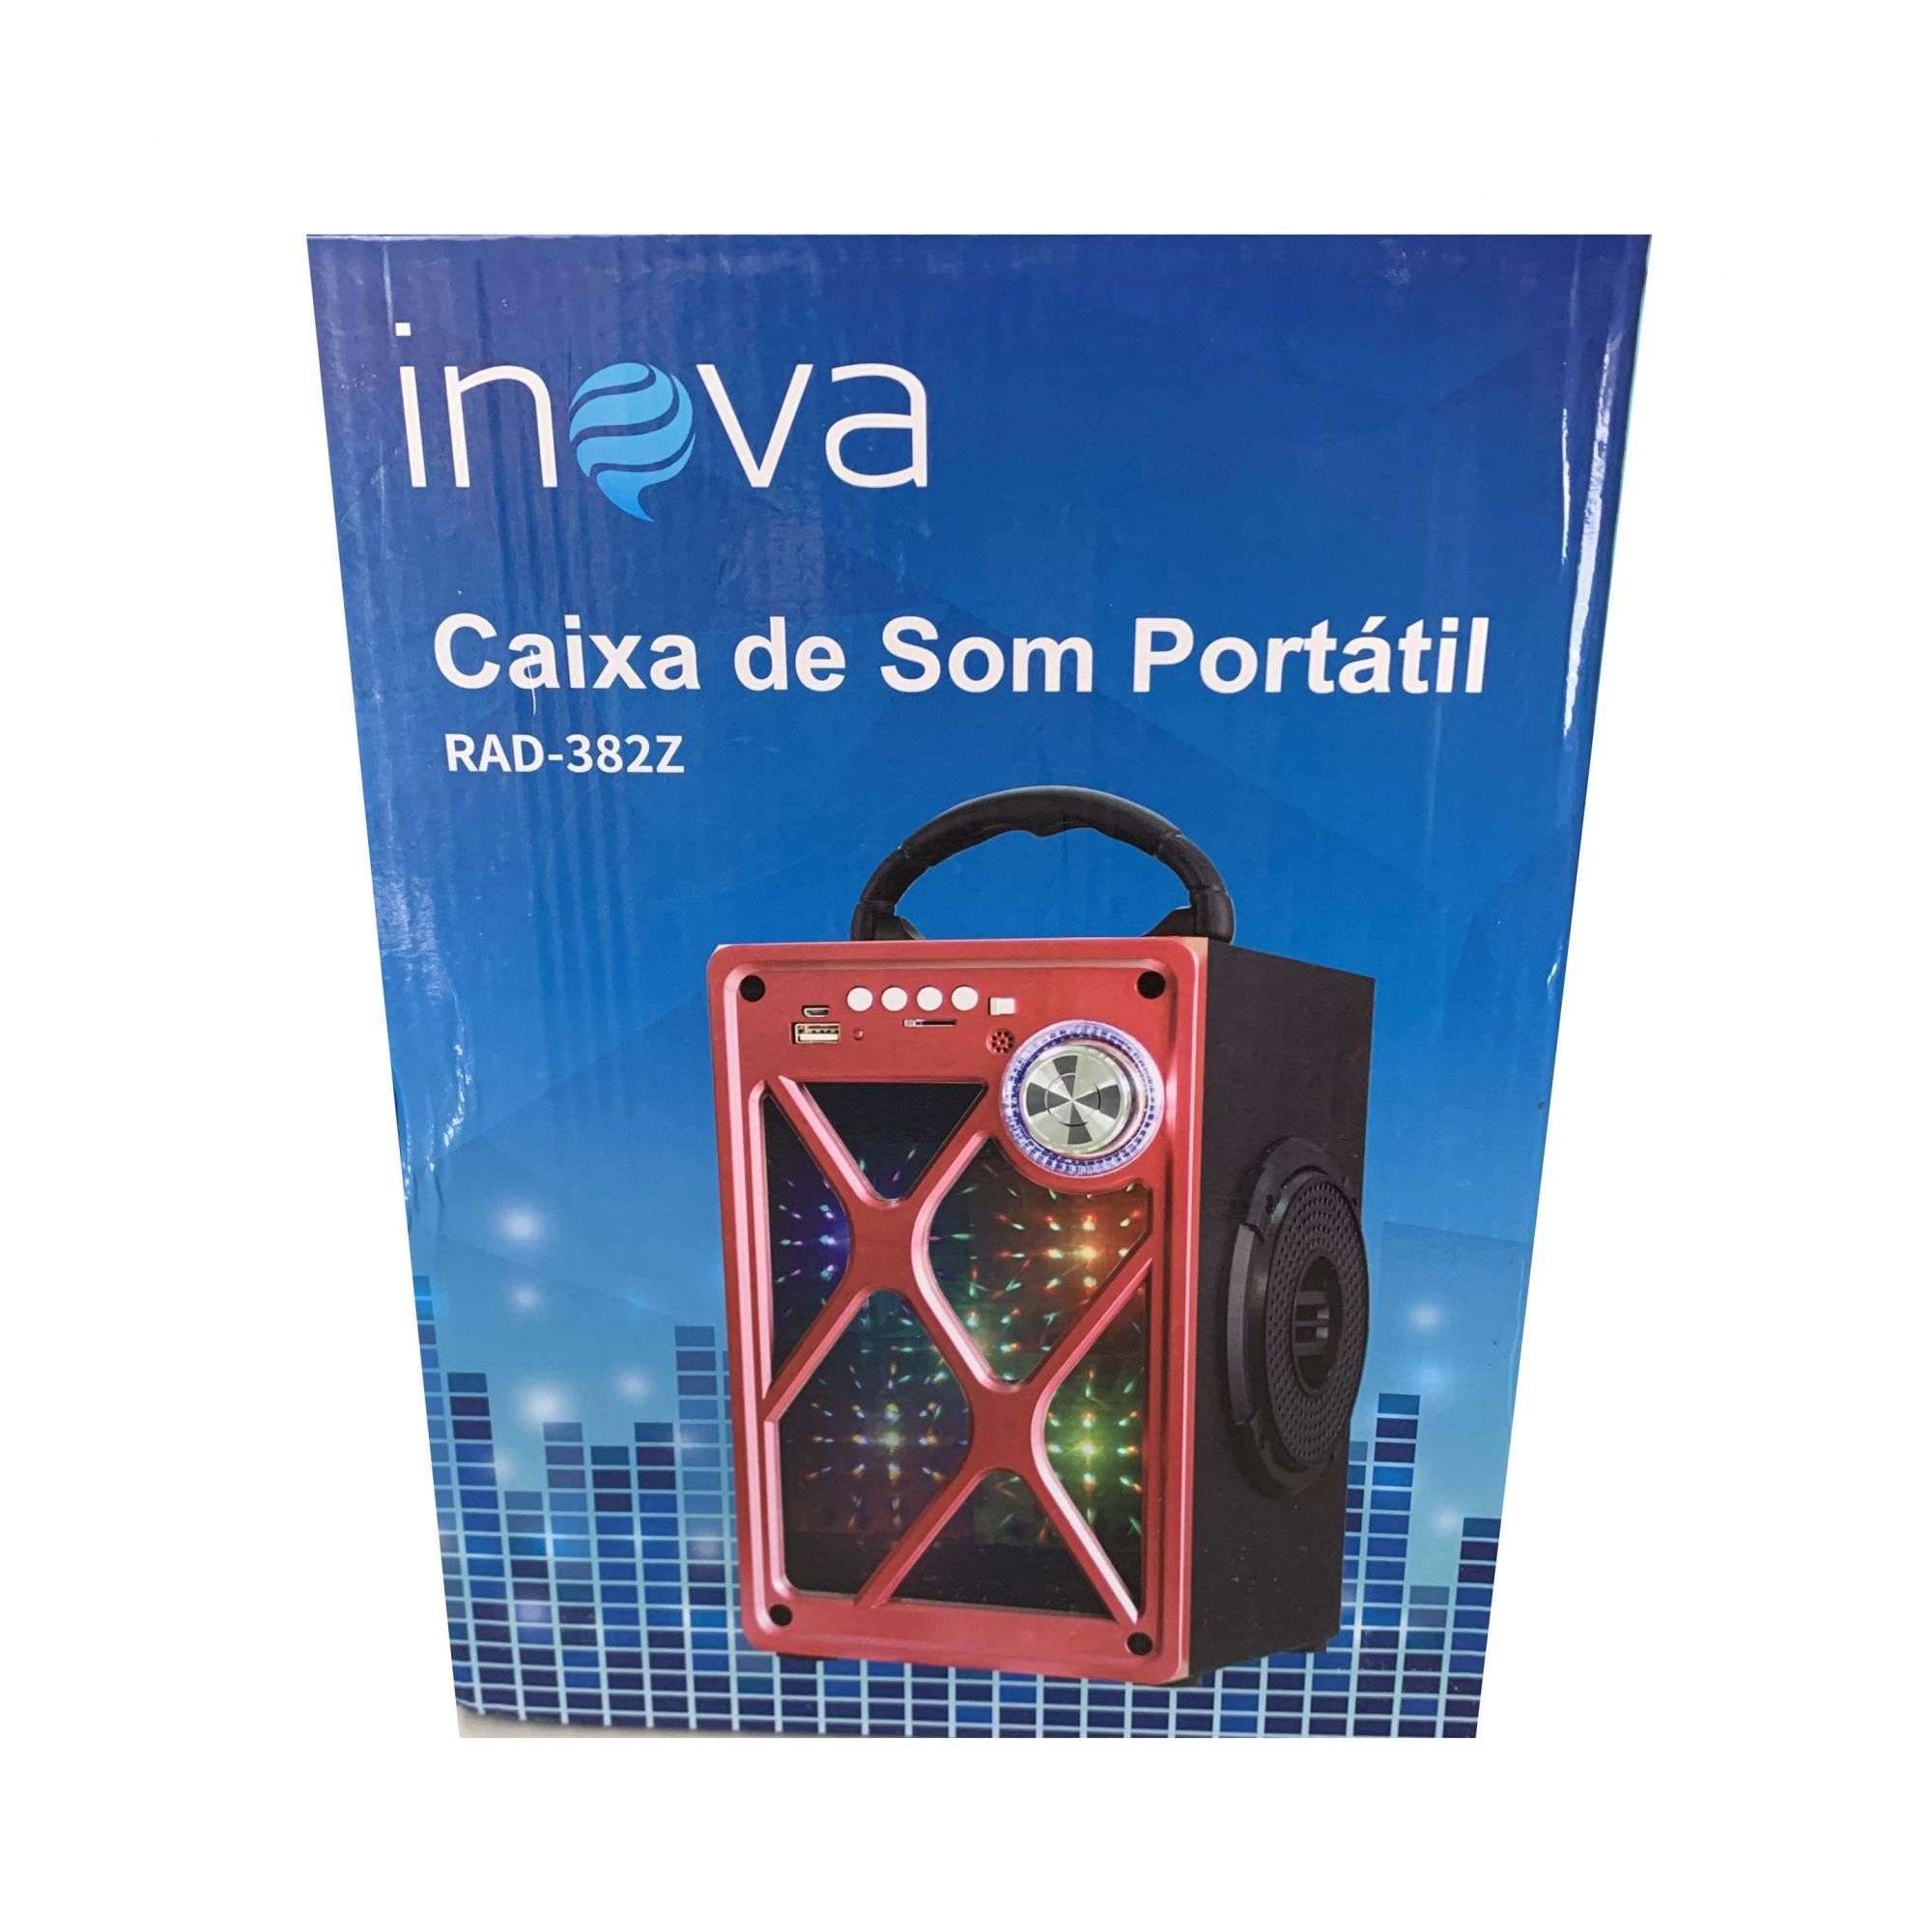 Caixa de som Inova RAD-382Z